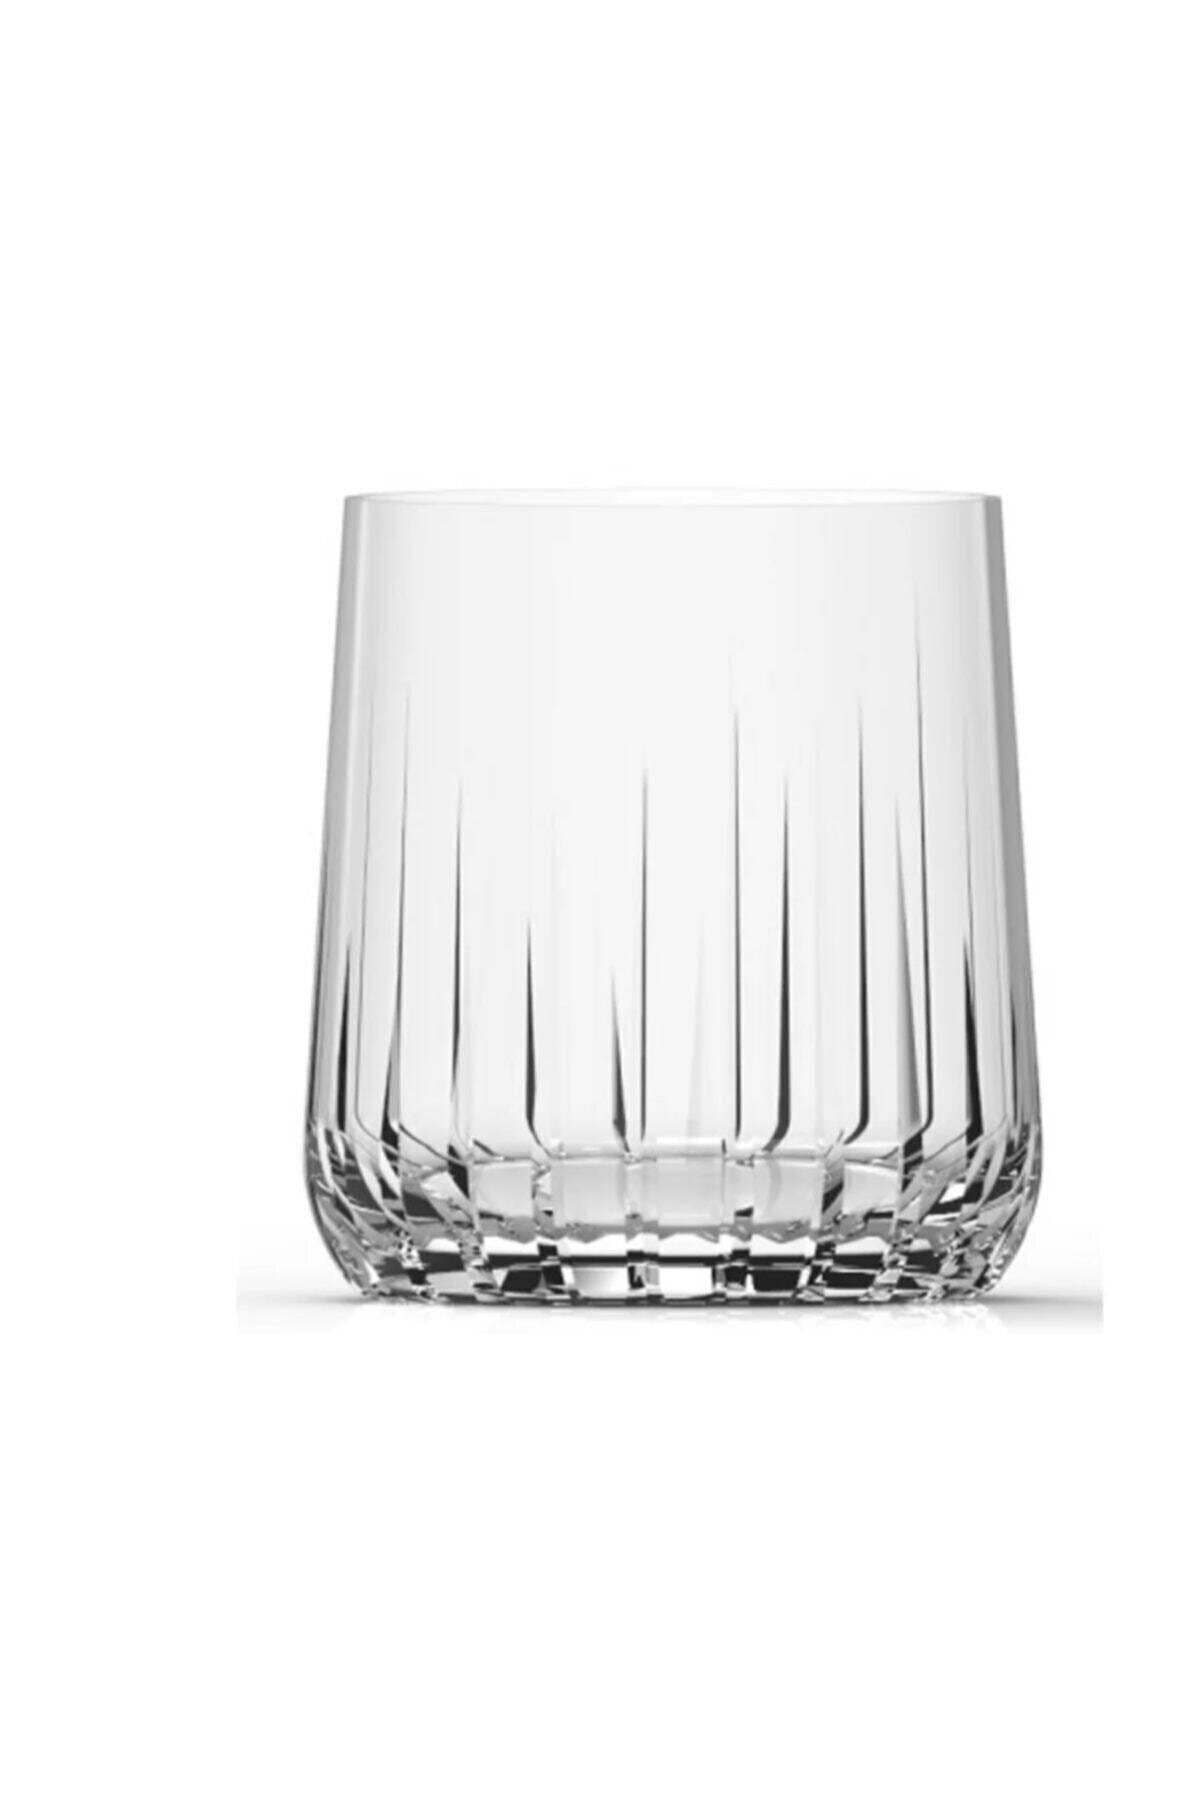 Paşabahçe 420154 Nova Su Bardağı 3'lü 2